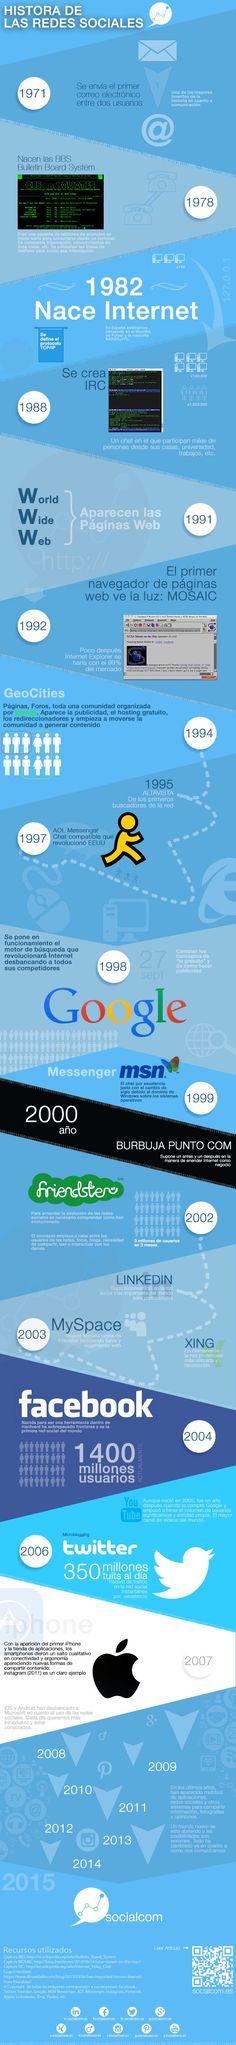 Historia de las Redes Sociales #infografia #infographic #socialmedia